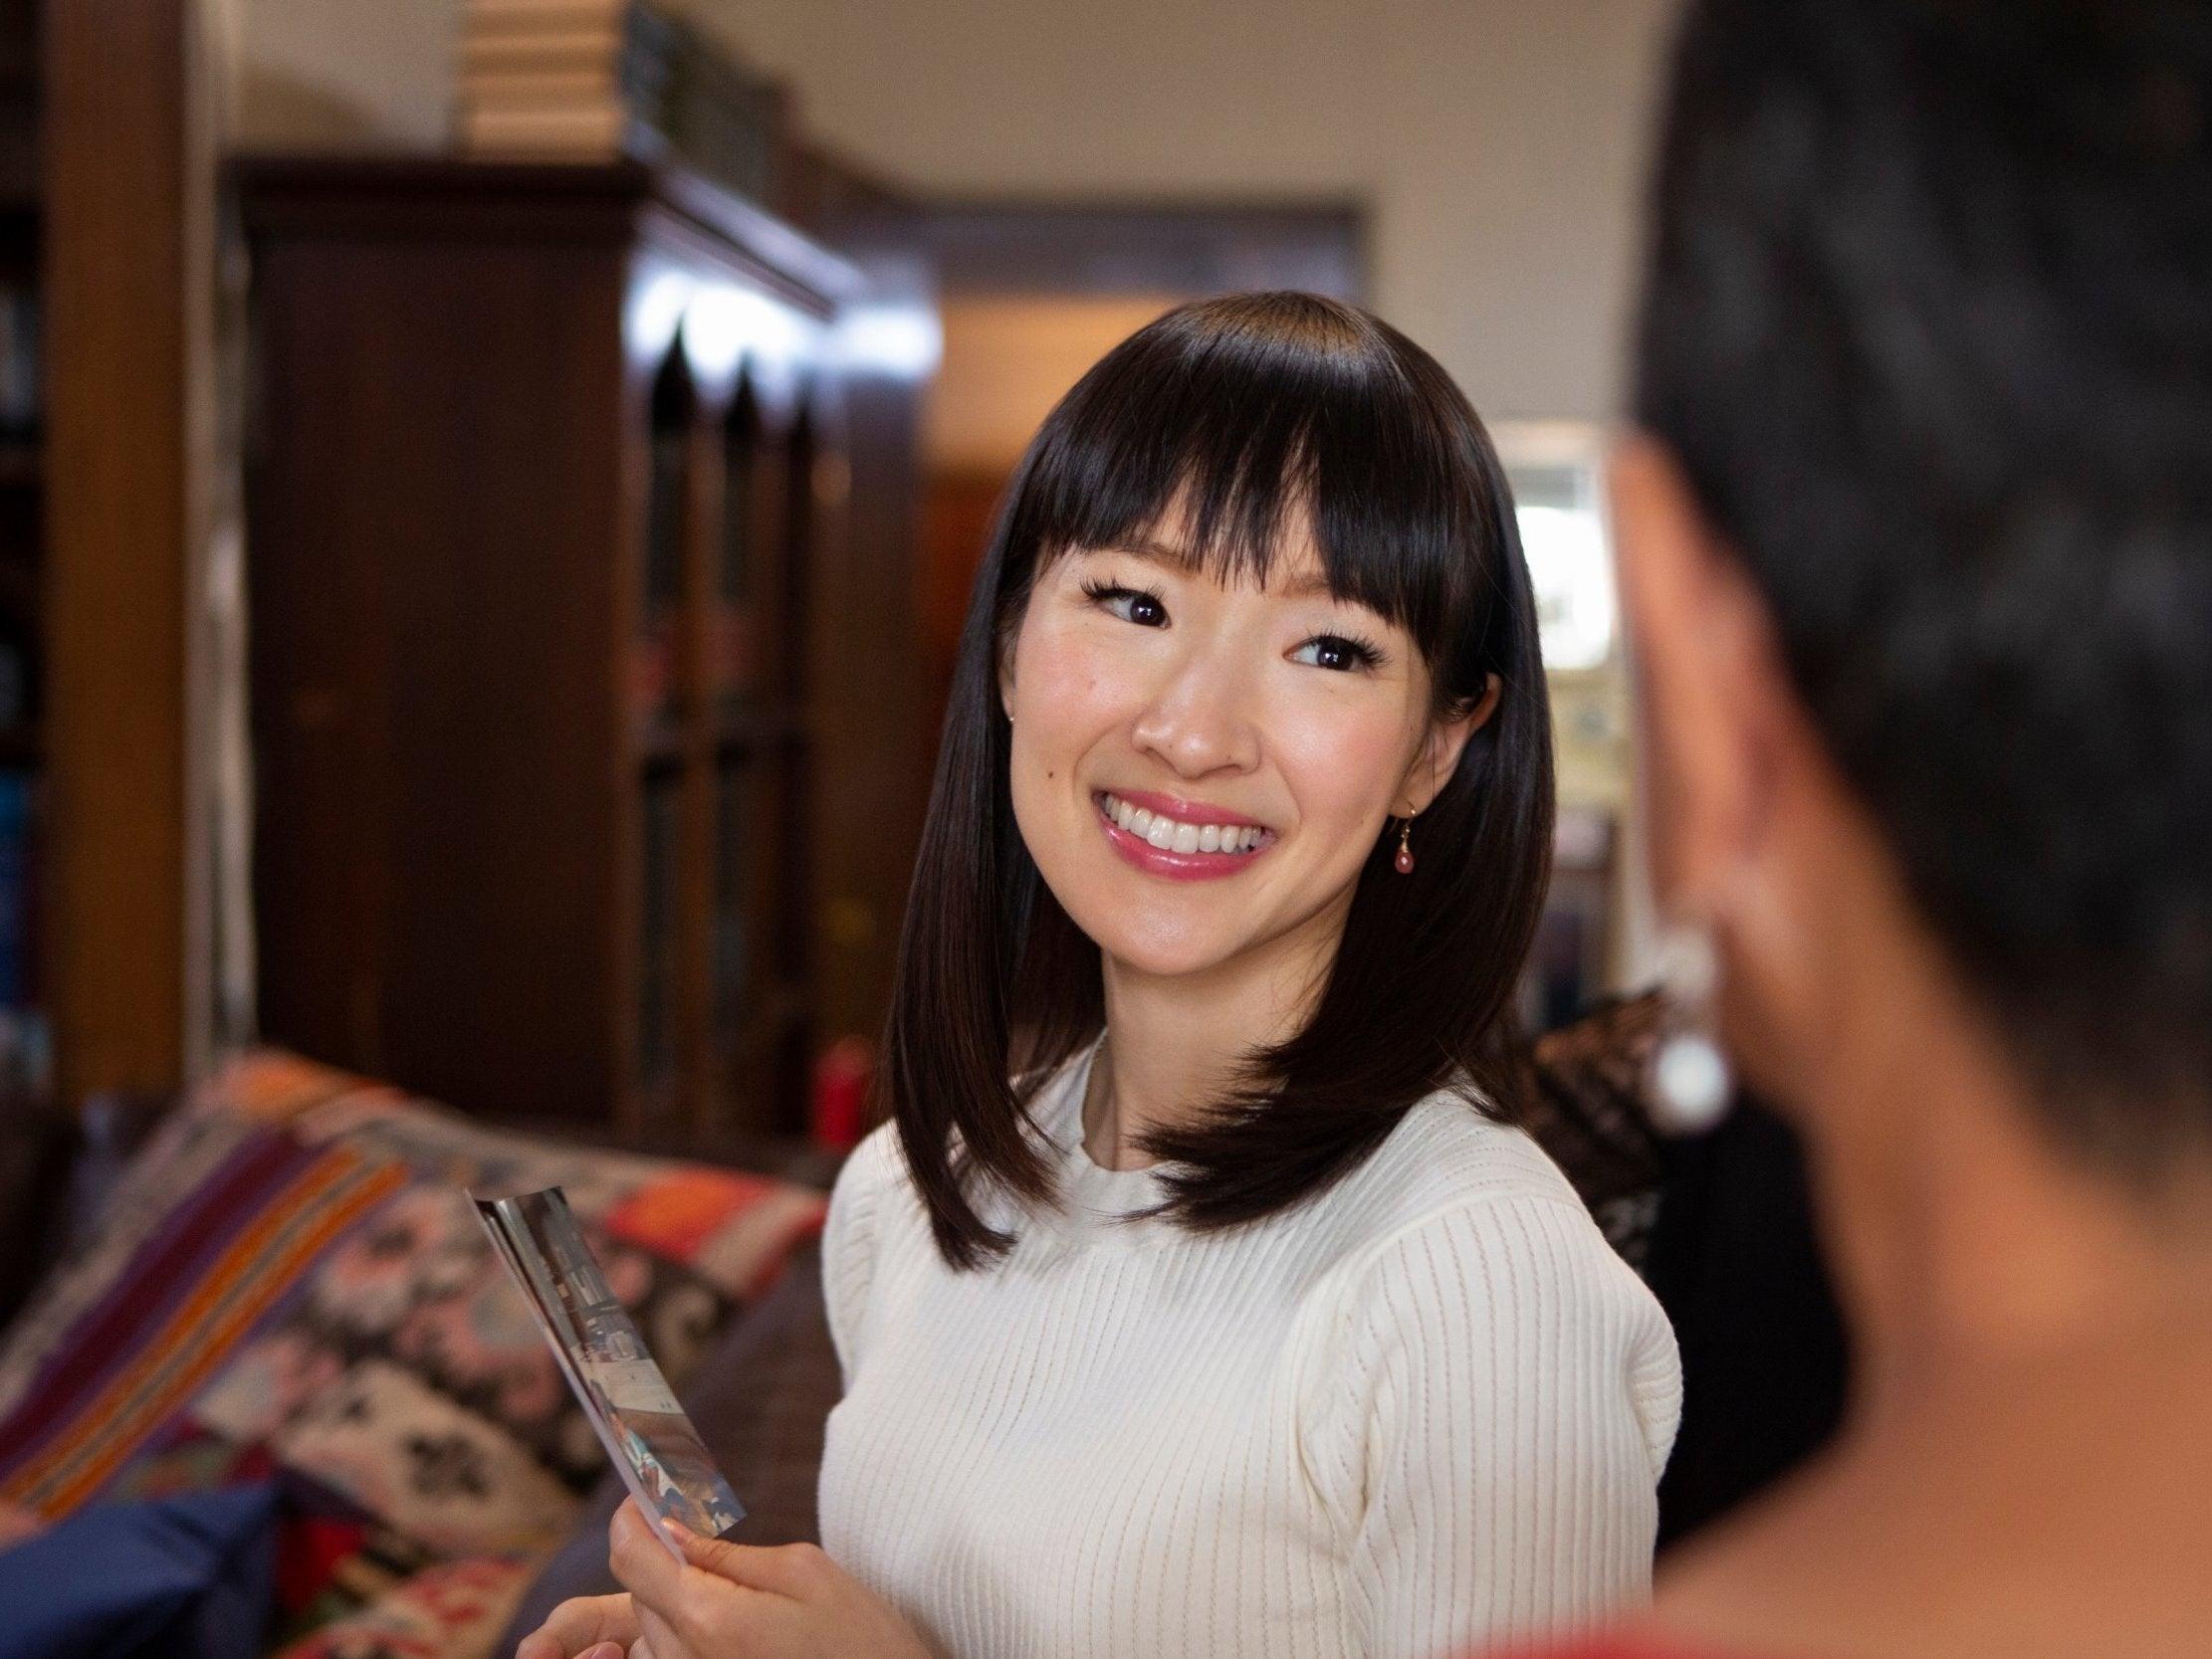 Marie Kondo on how to apply the KonMari method to your makeup bag